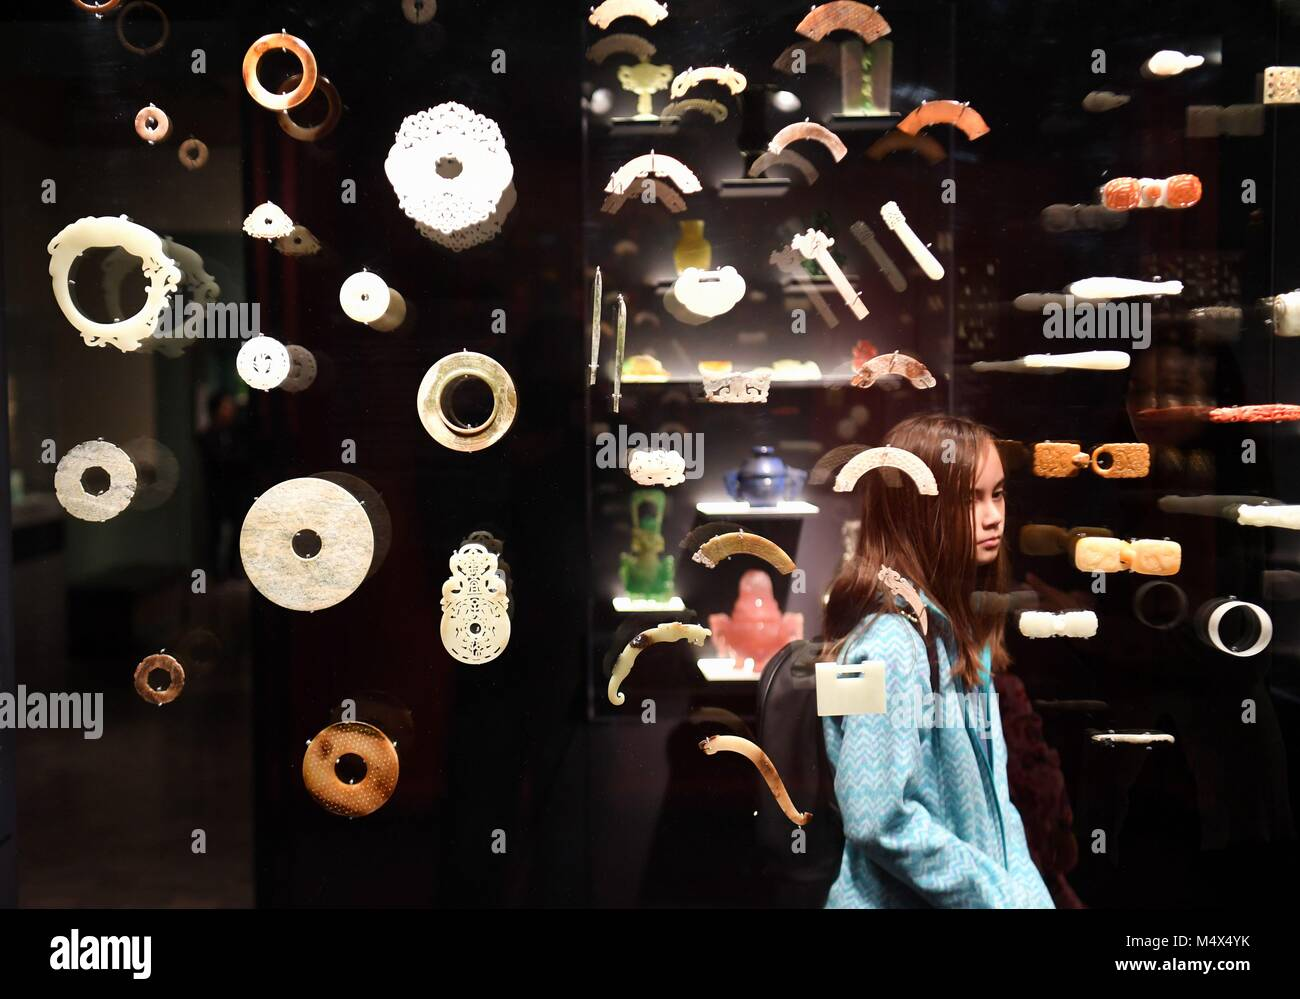 San Francisco, USA. 18th Feb, 2018. A girl visits a jade crafts exhibition at Asian Art Museum in San Francisco, - Stock Image